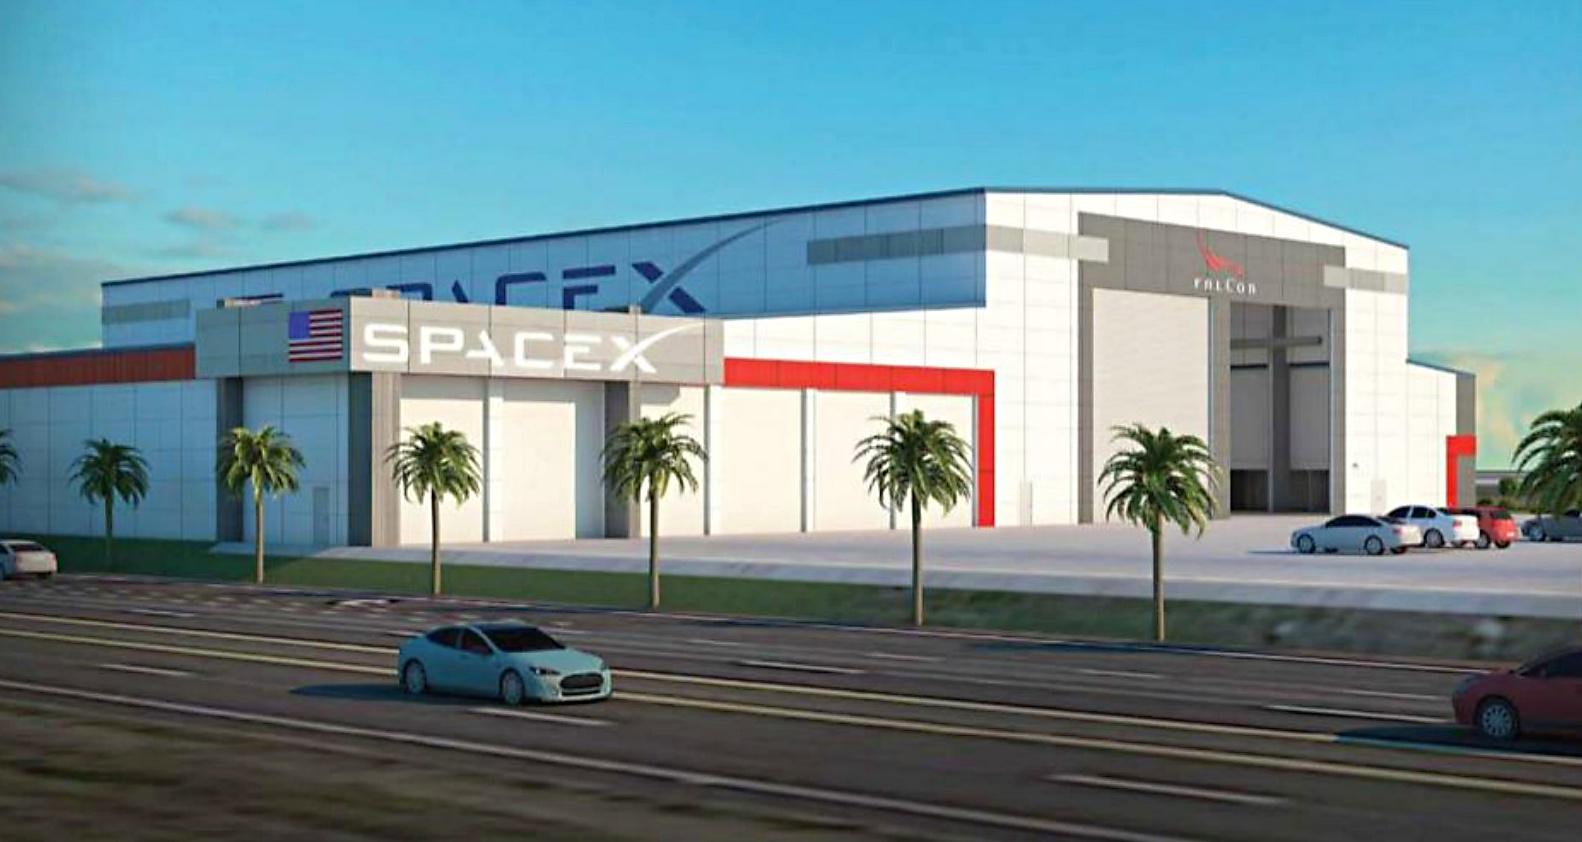 SpaceX-Falcon-Dragon-refurb-facility-floriday-splash